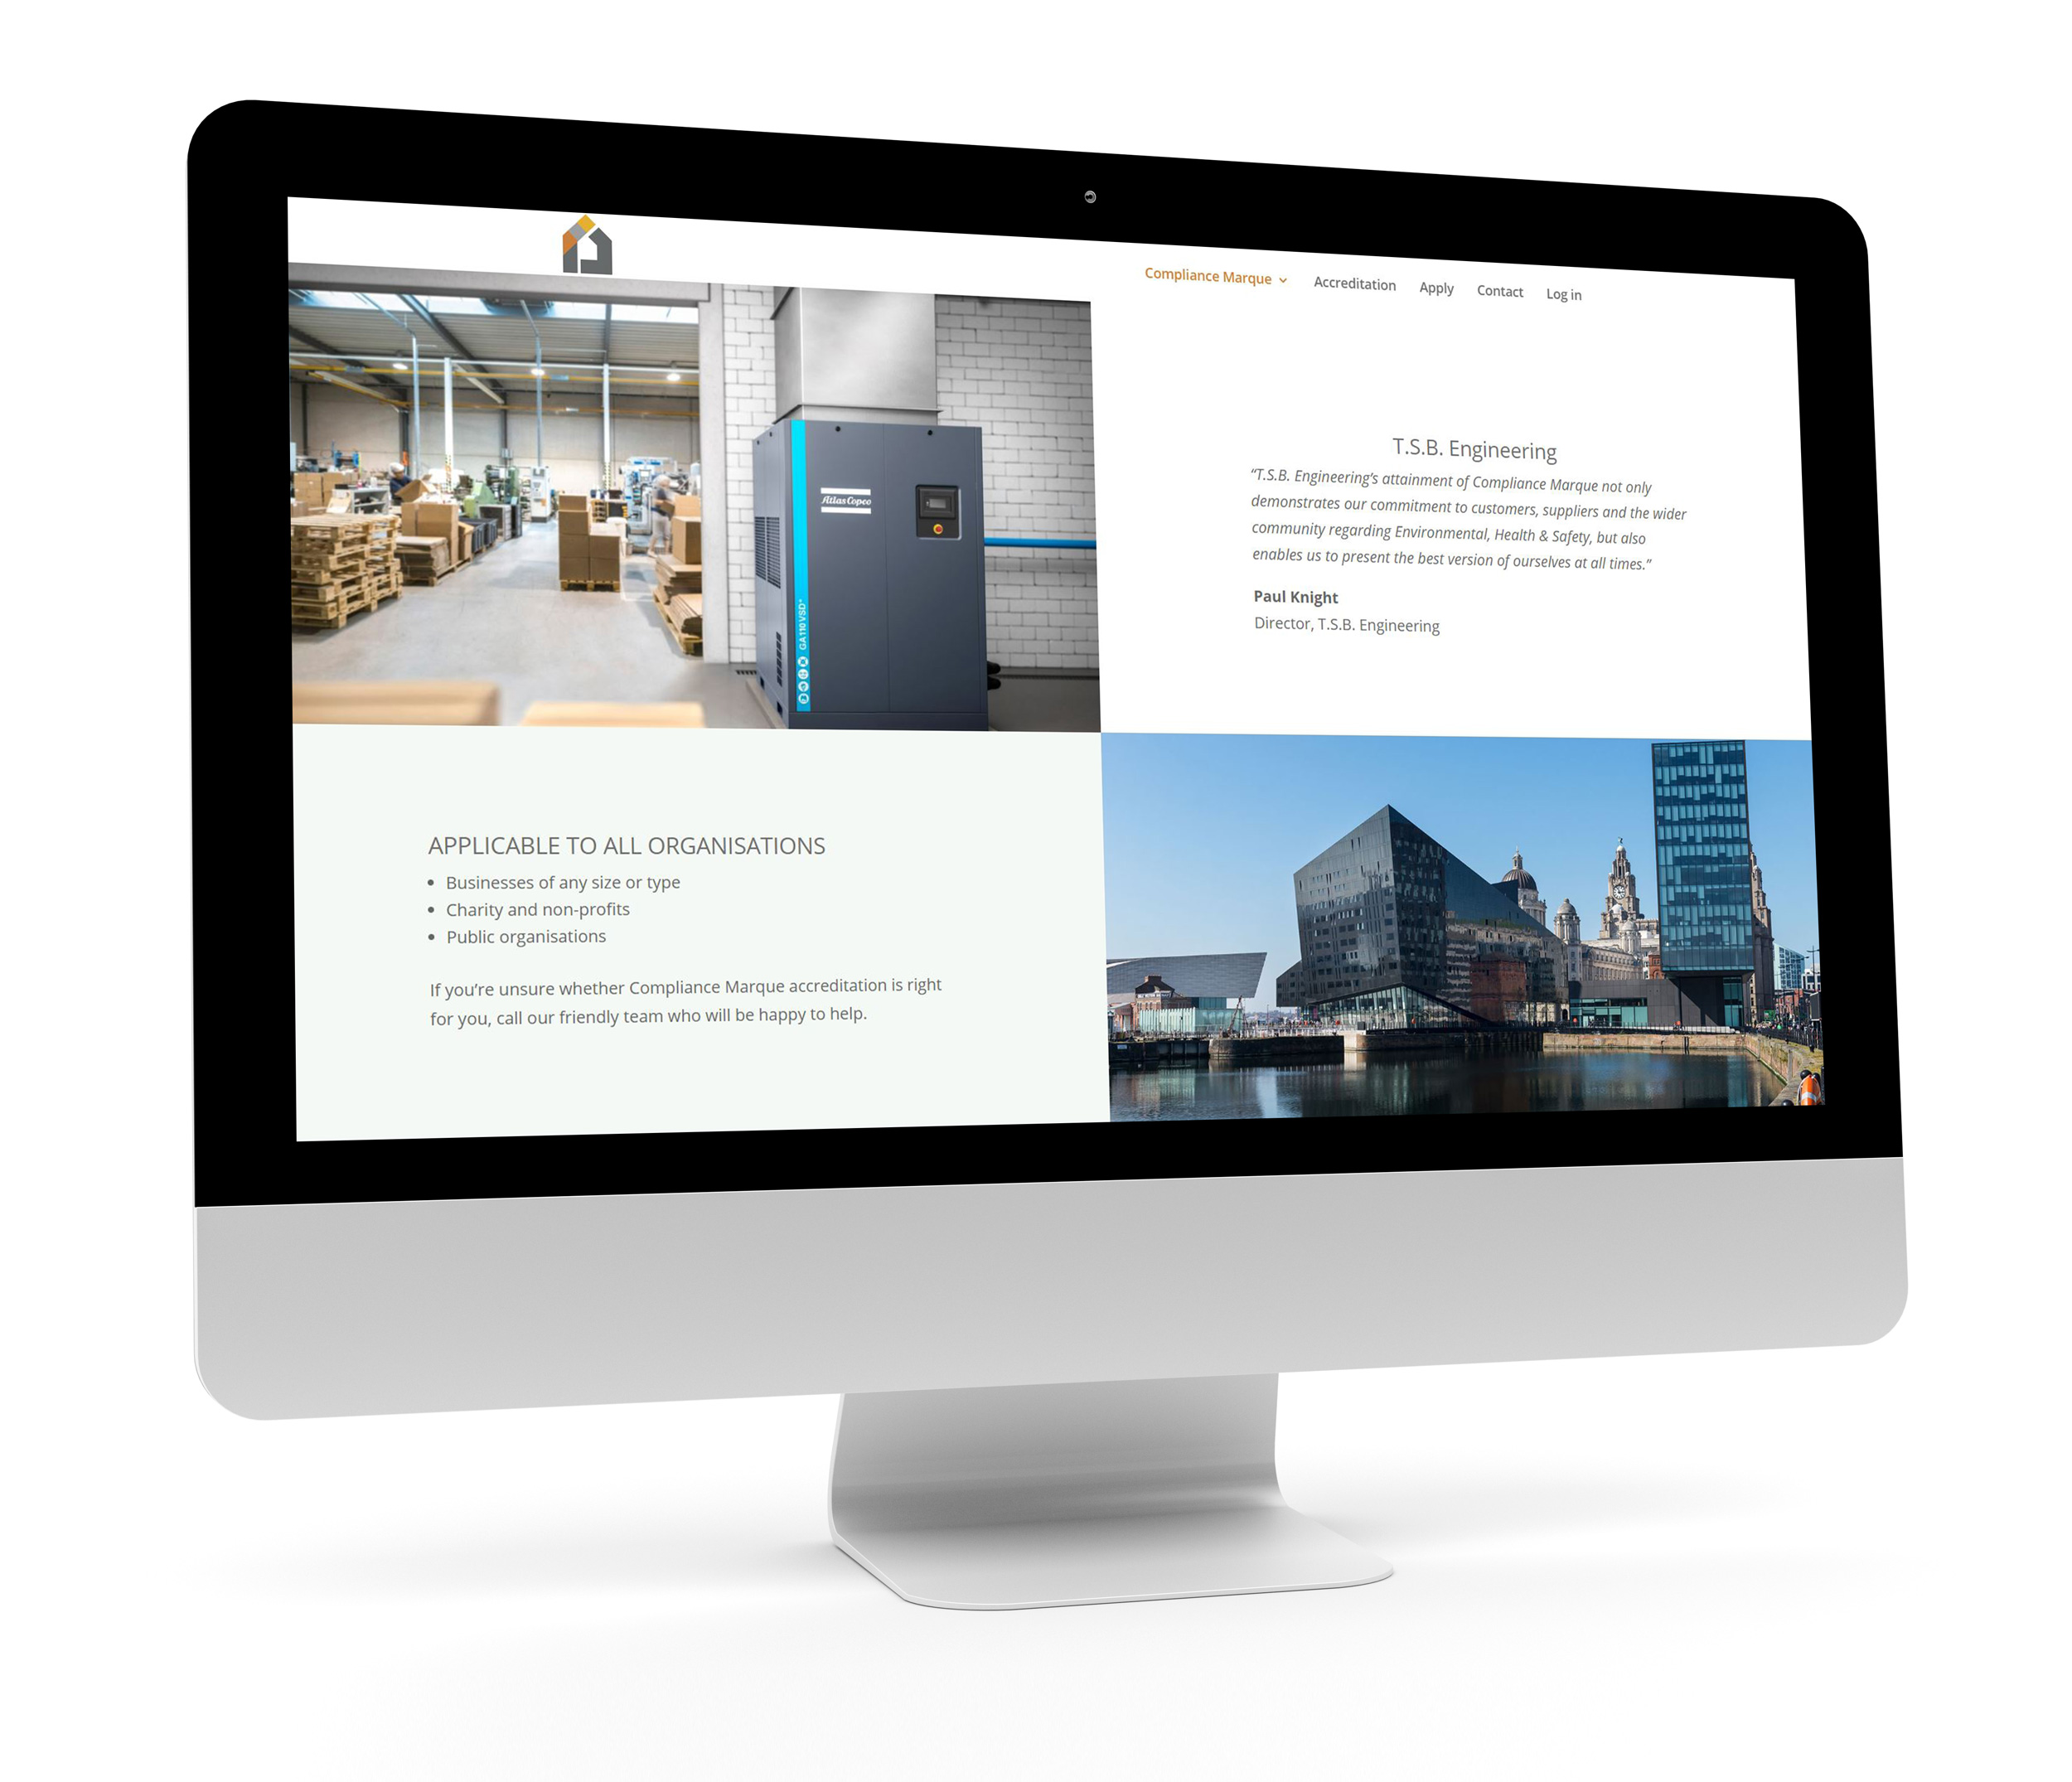 Desktop Website Design example by CAPEX Marketing 2